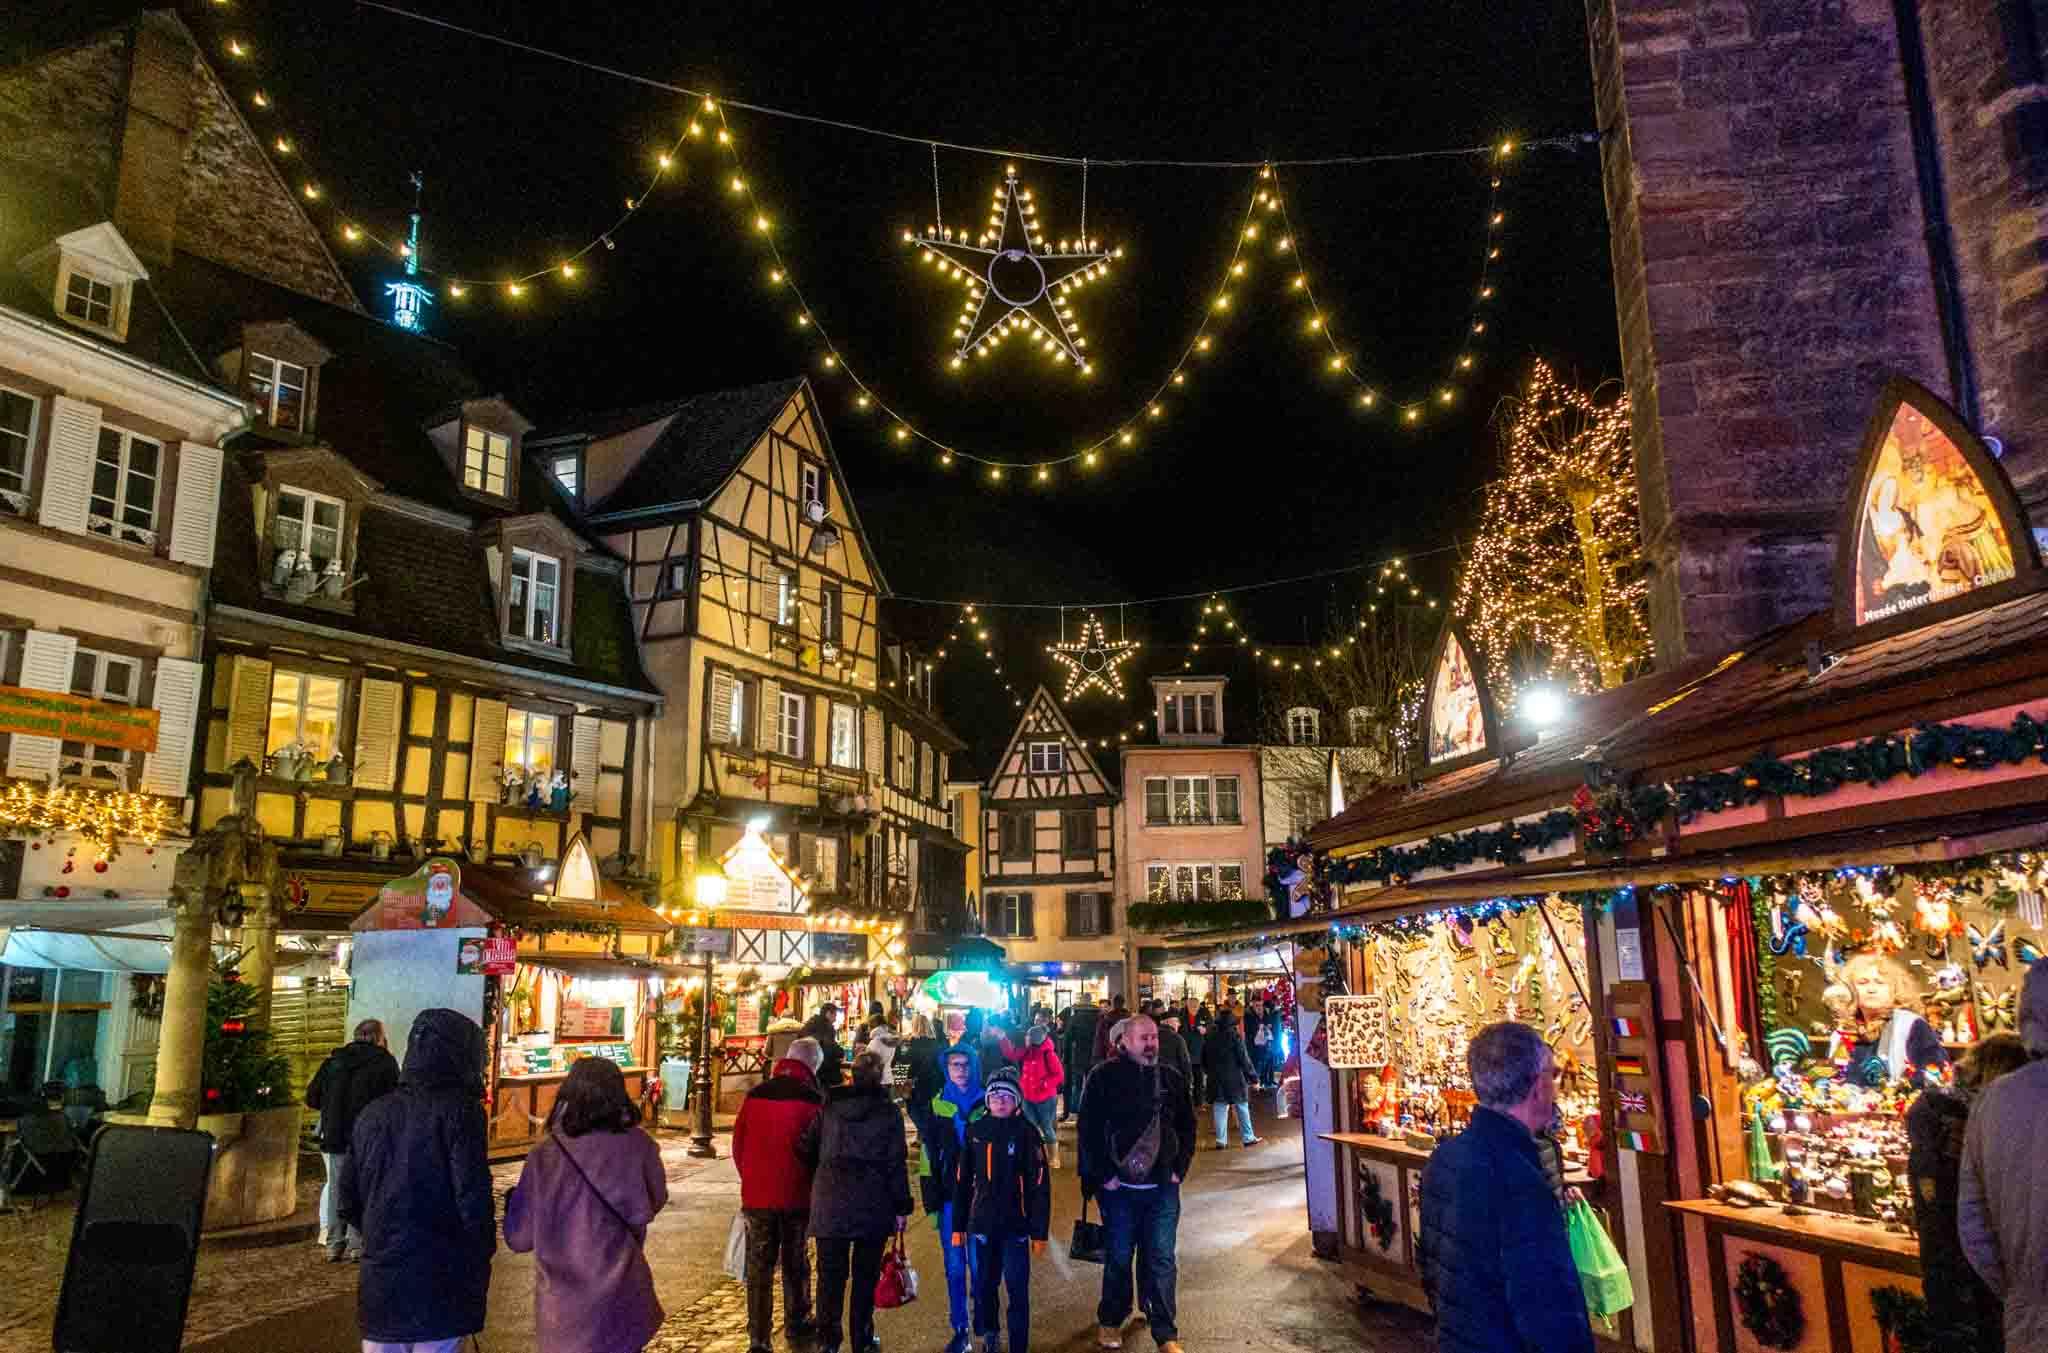 People shopping at stalls at the Colmar Christmas market at night